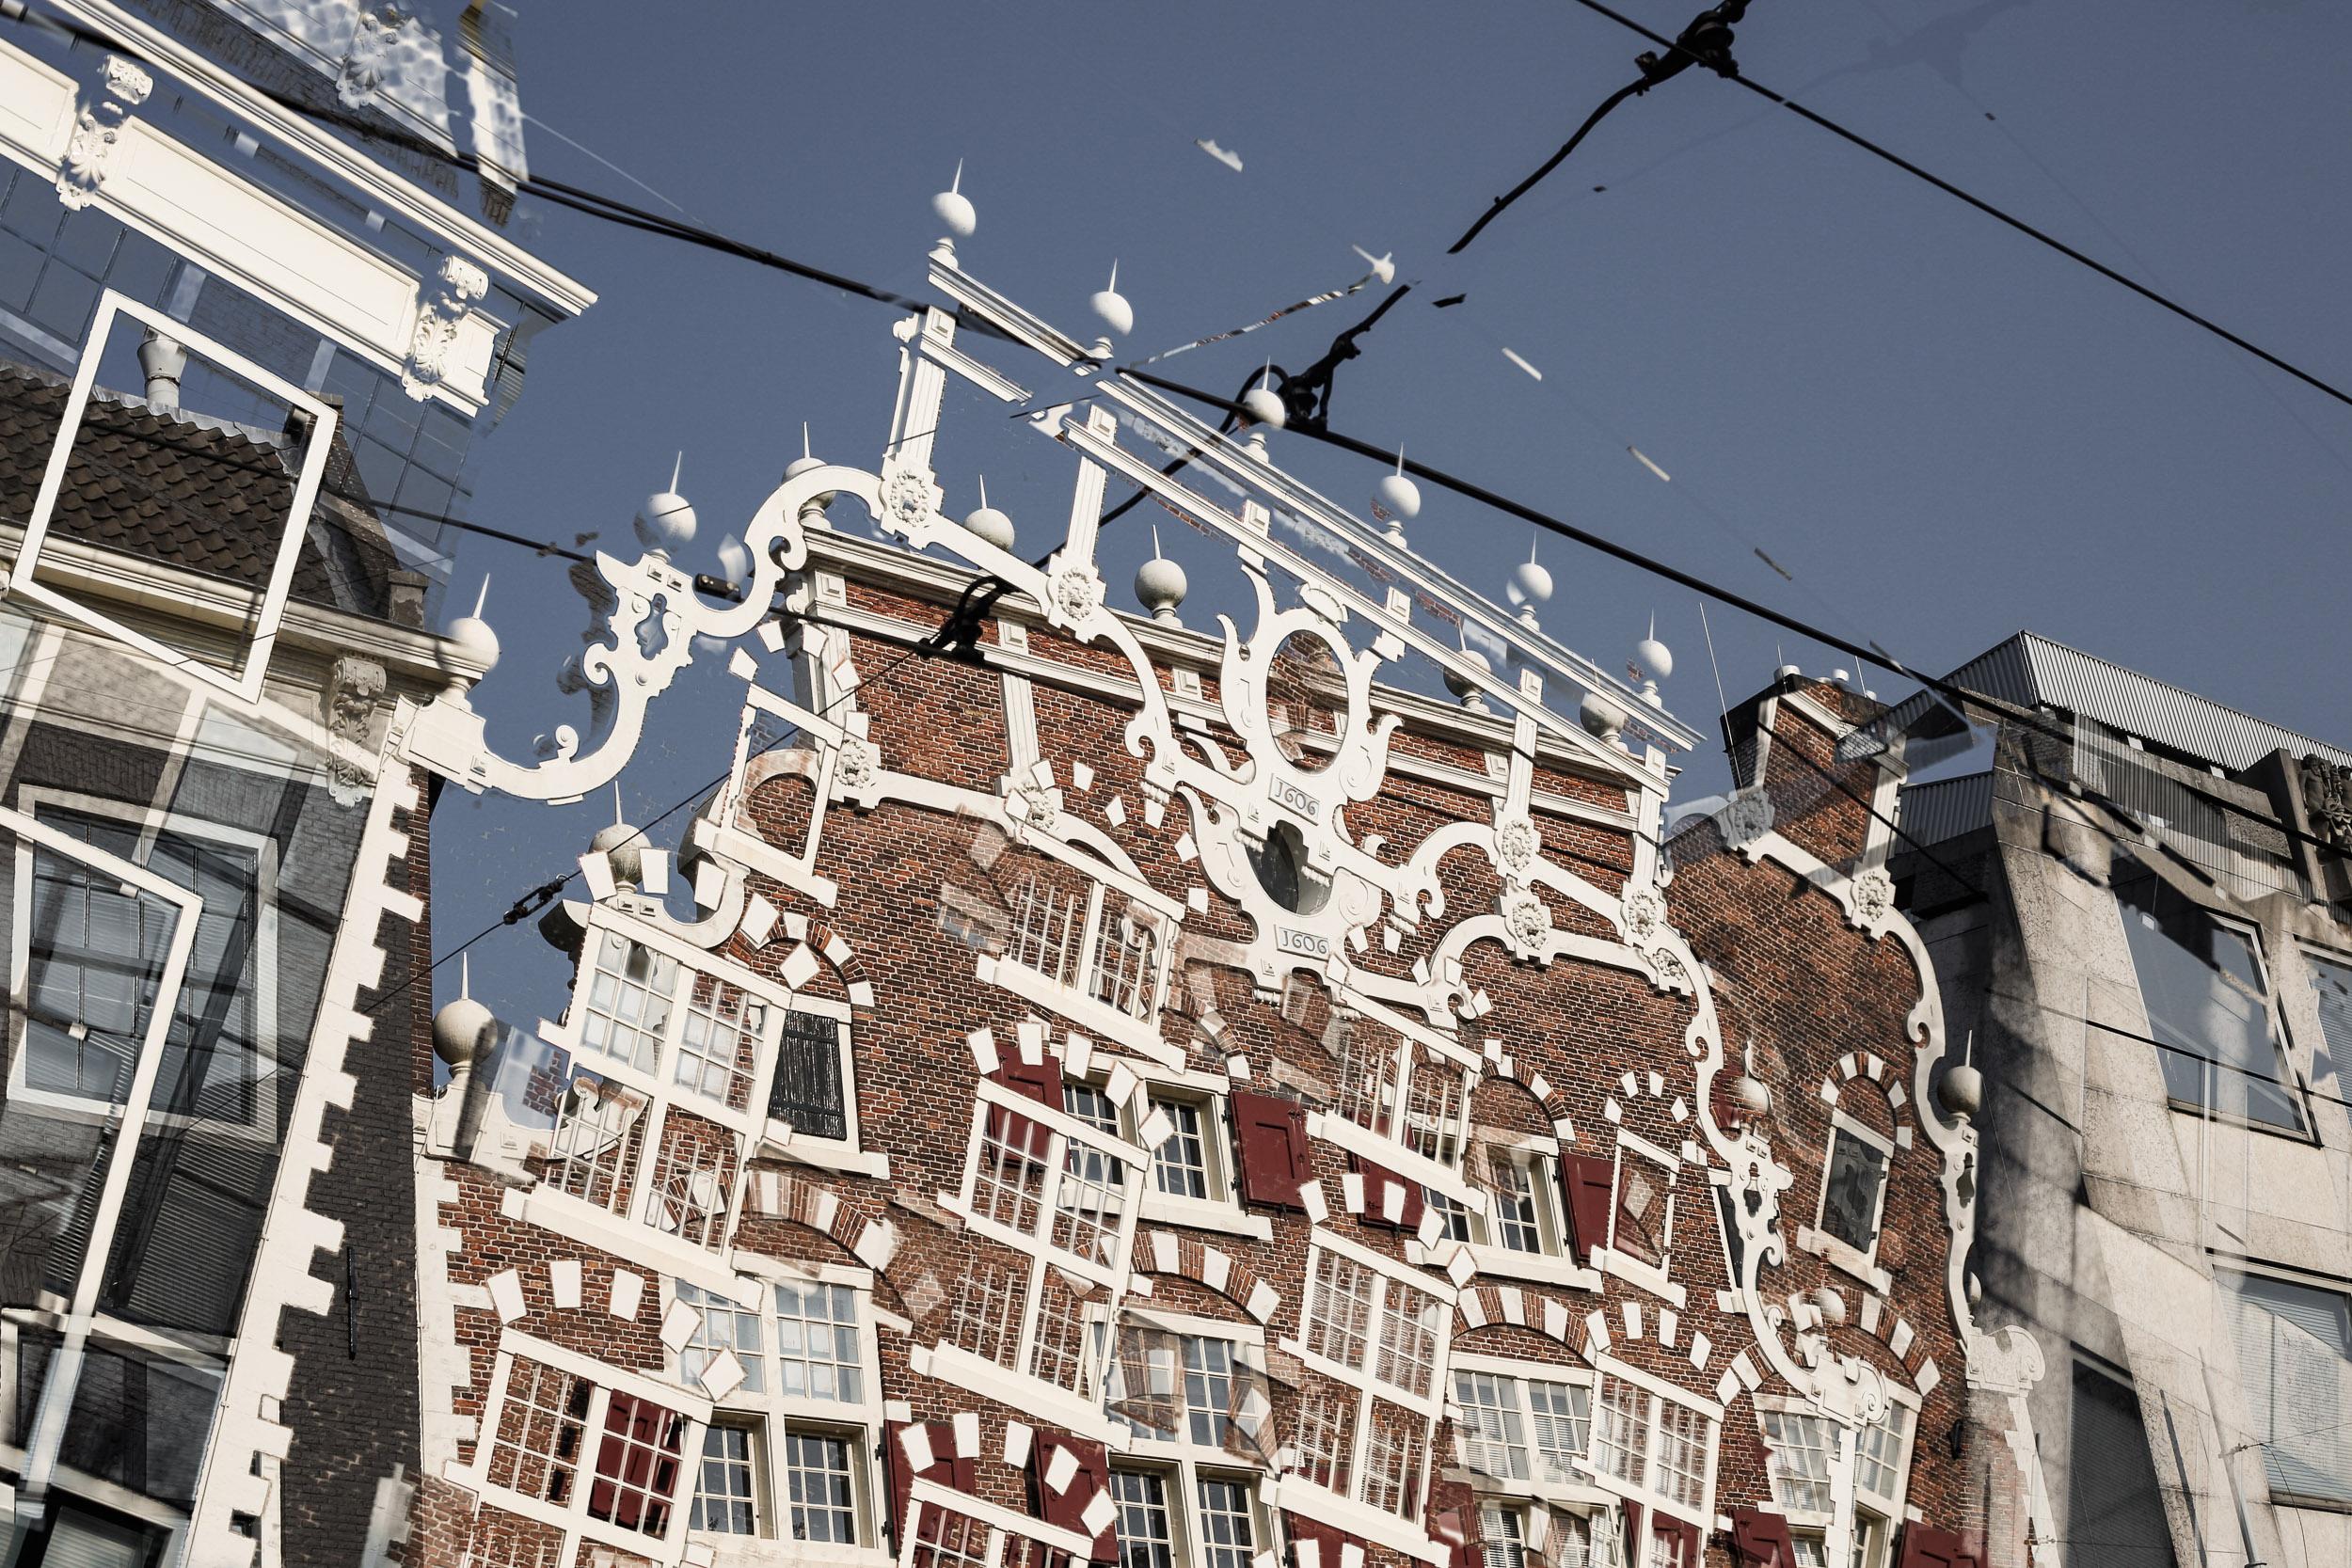 Displaced Amsterdam R_Rodner-2.jpg.jpg